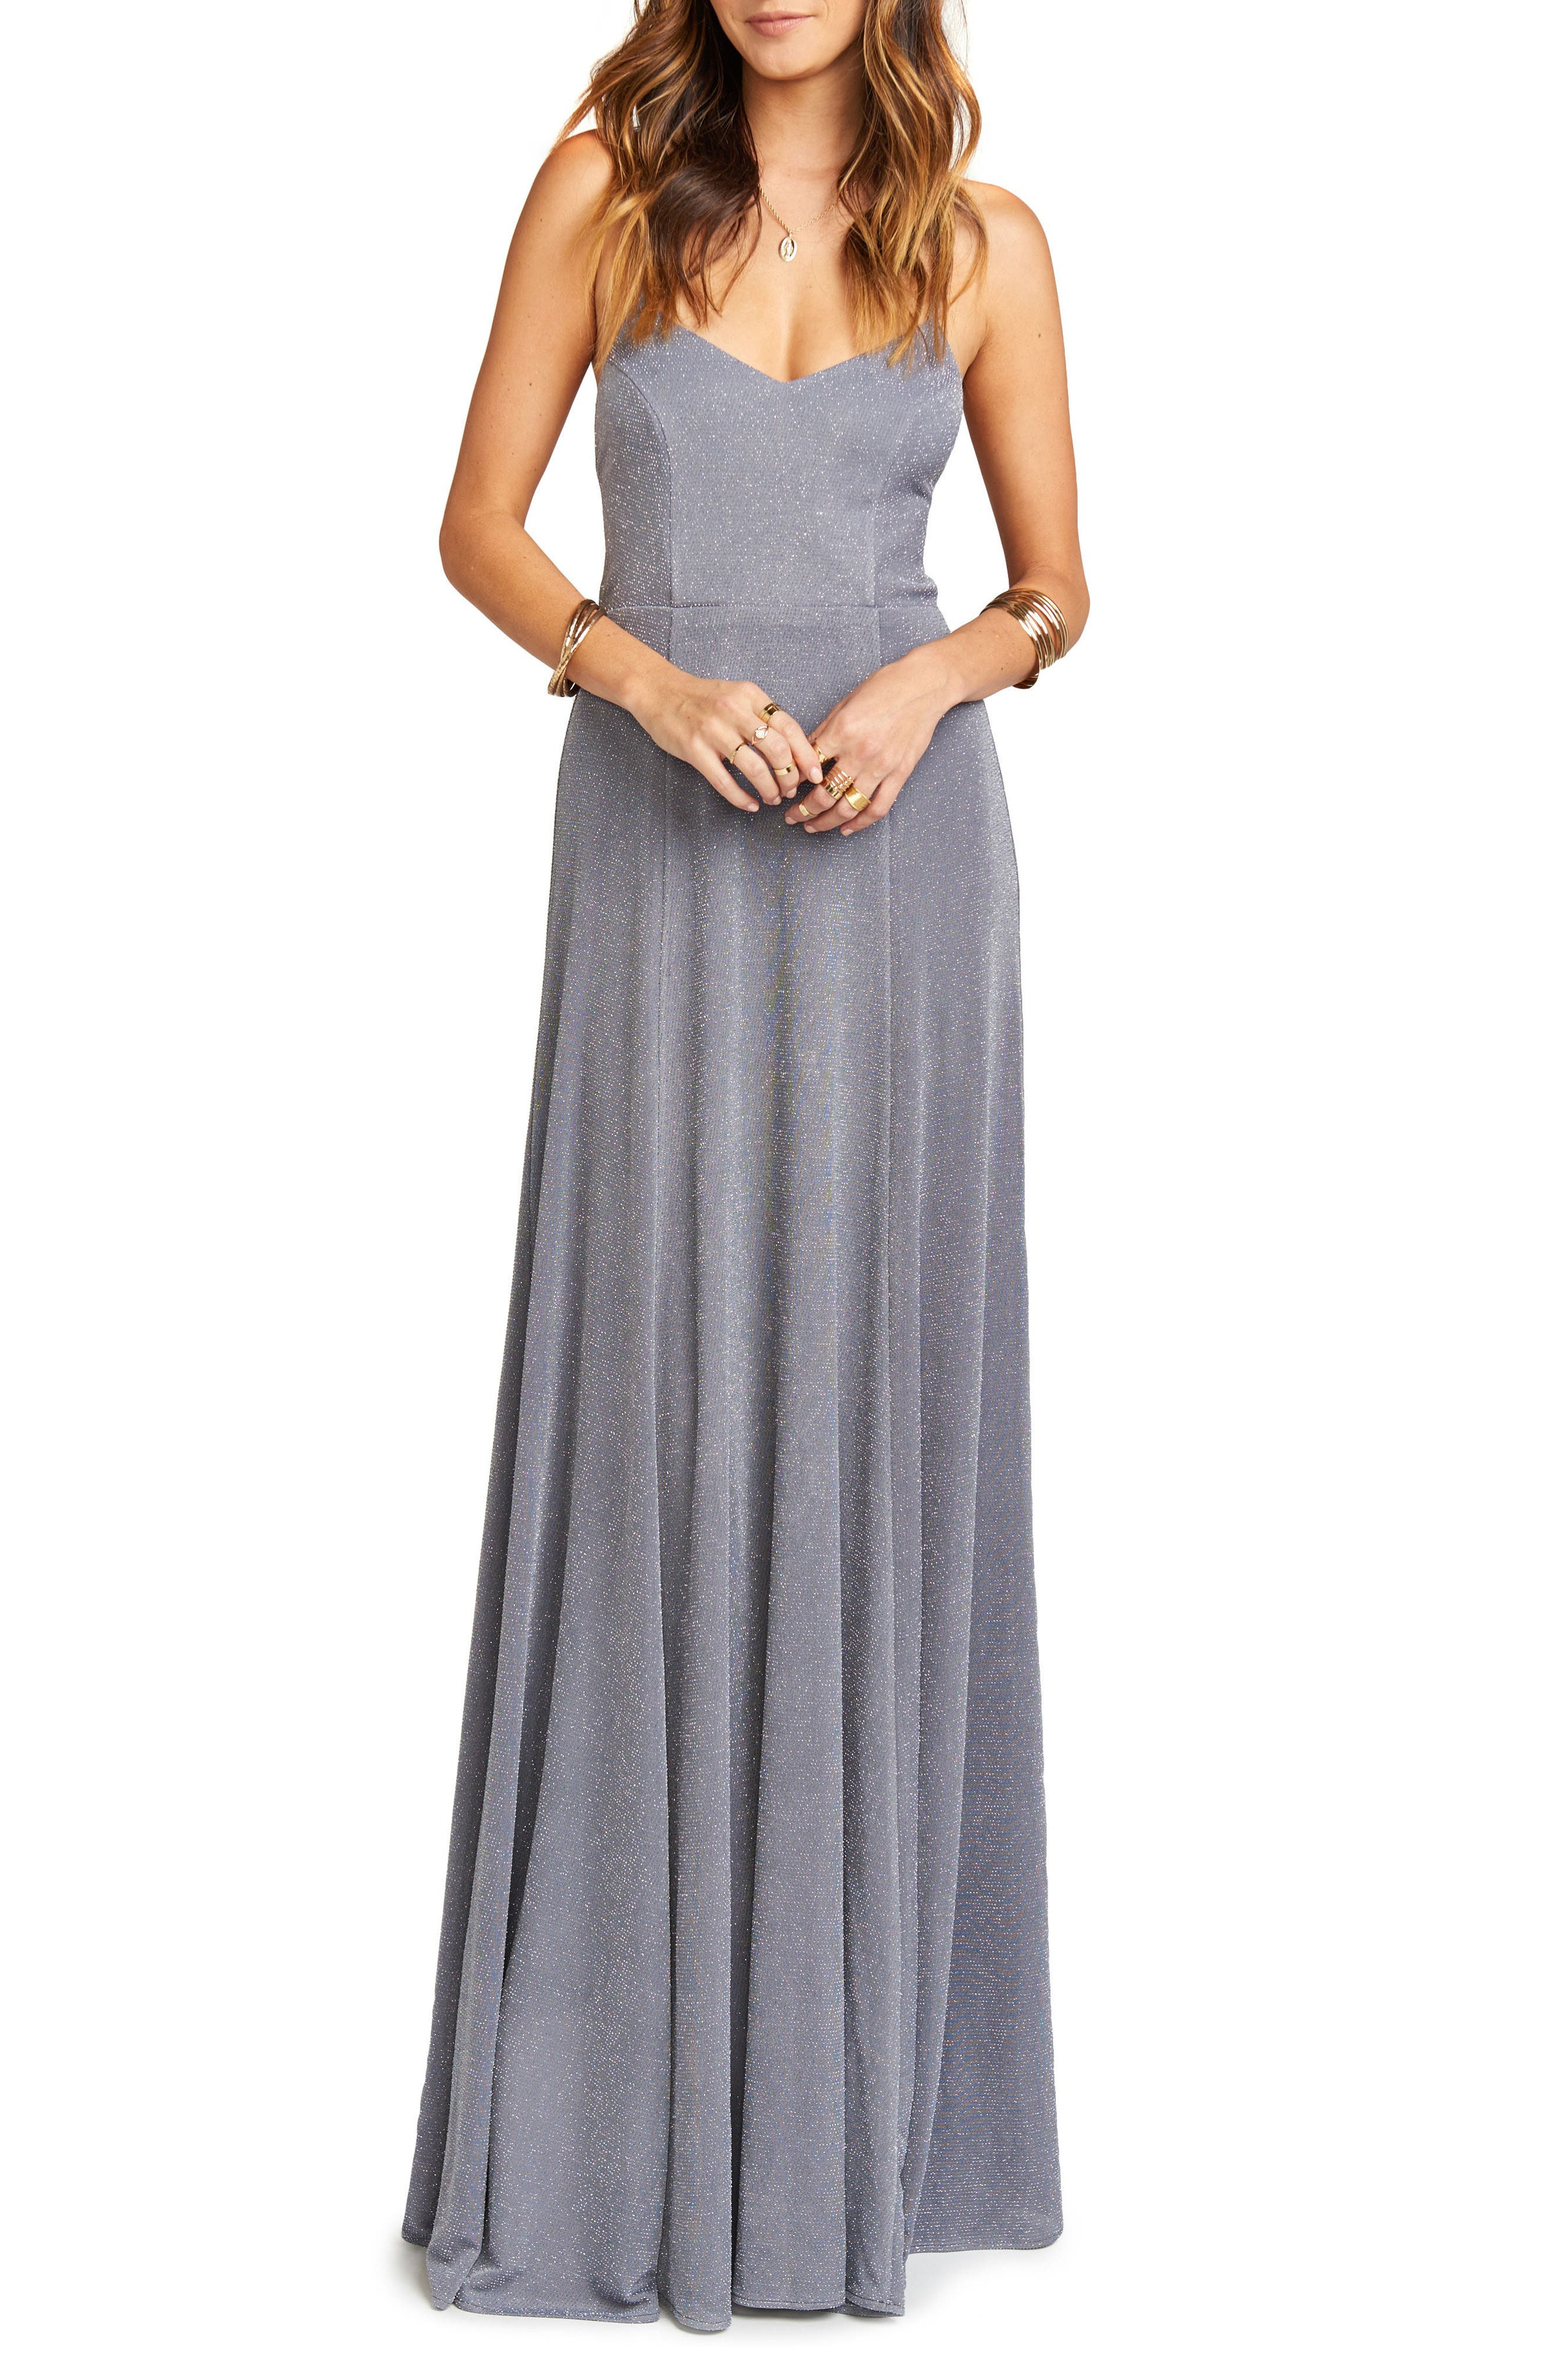 Godshaw Open Back Gown,                         Main,                         color, 030